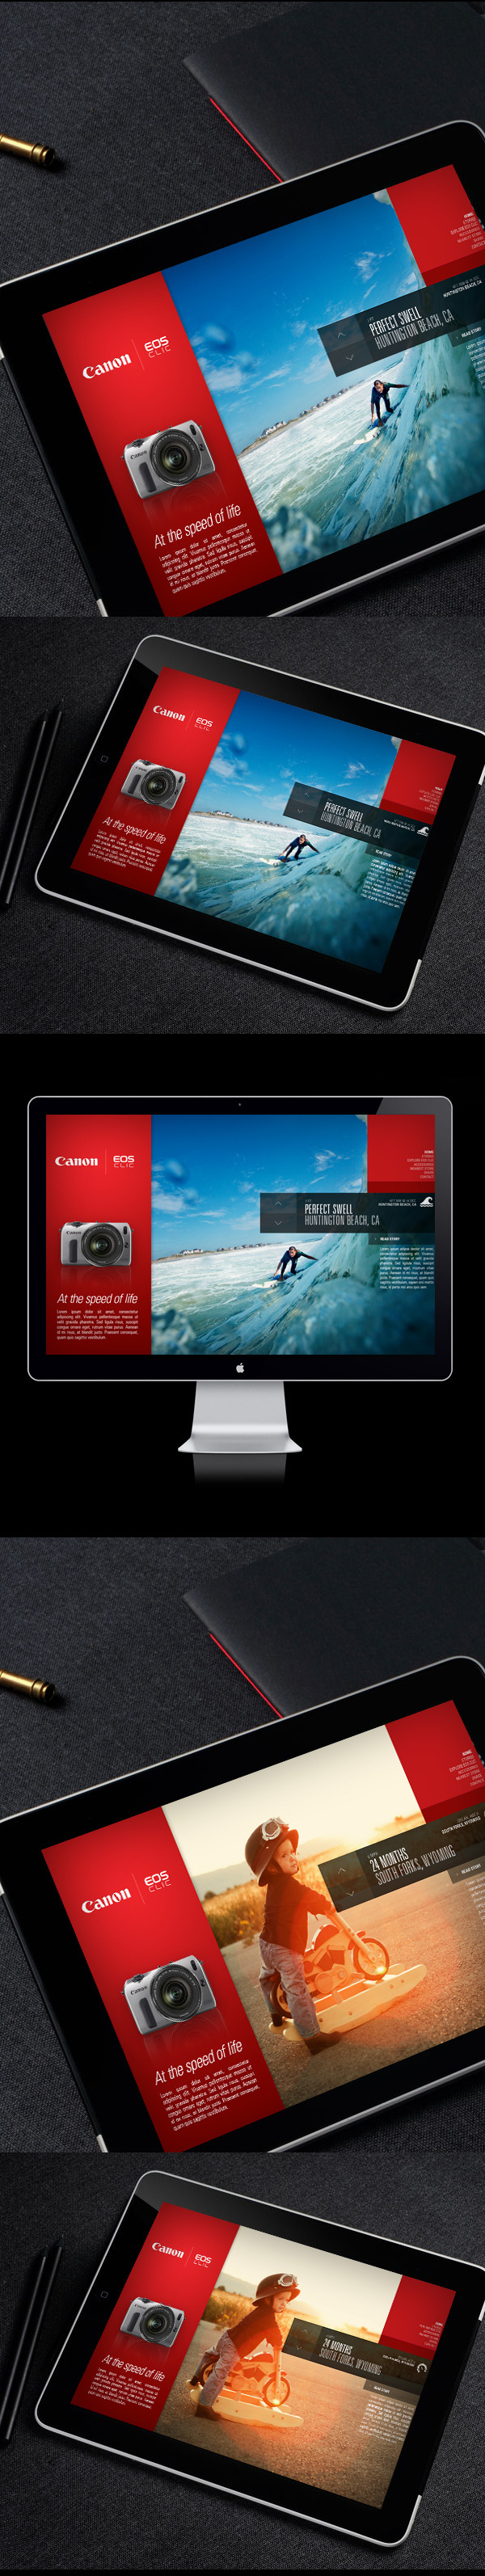 Canon EOS M / Campaign Microsite on Behance #photos #ui #website #photography #app